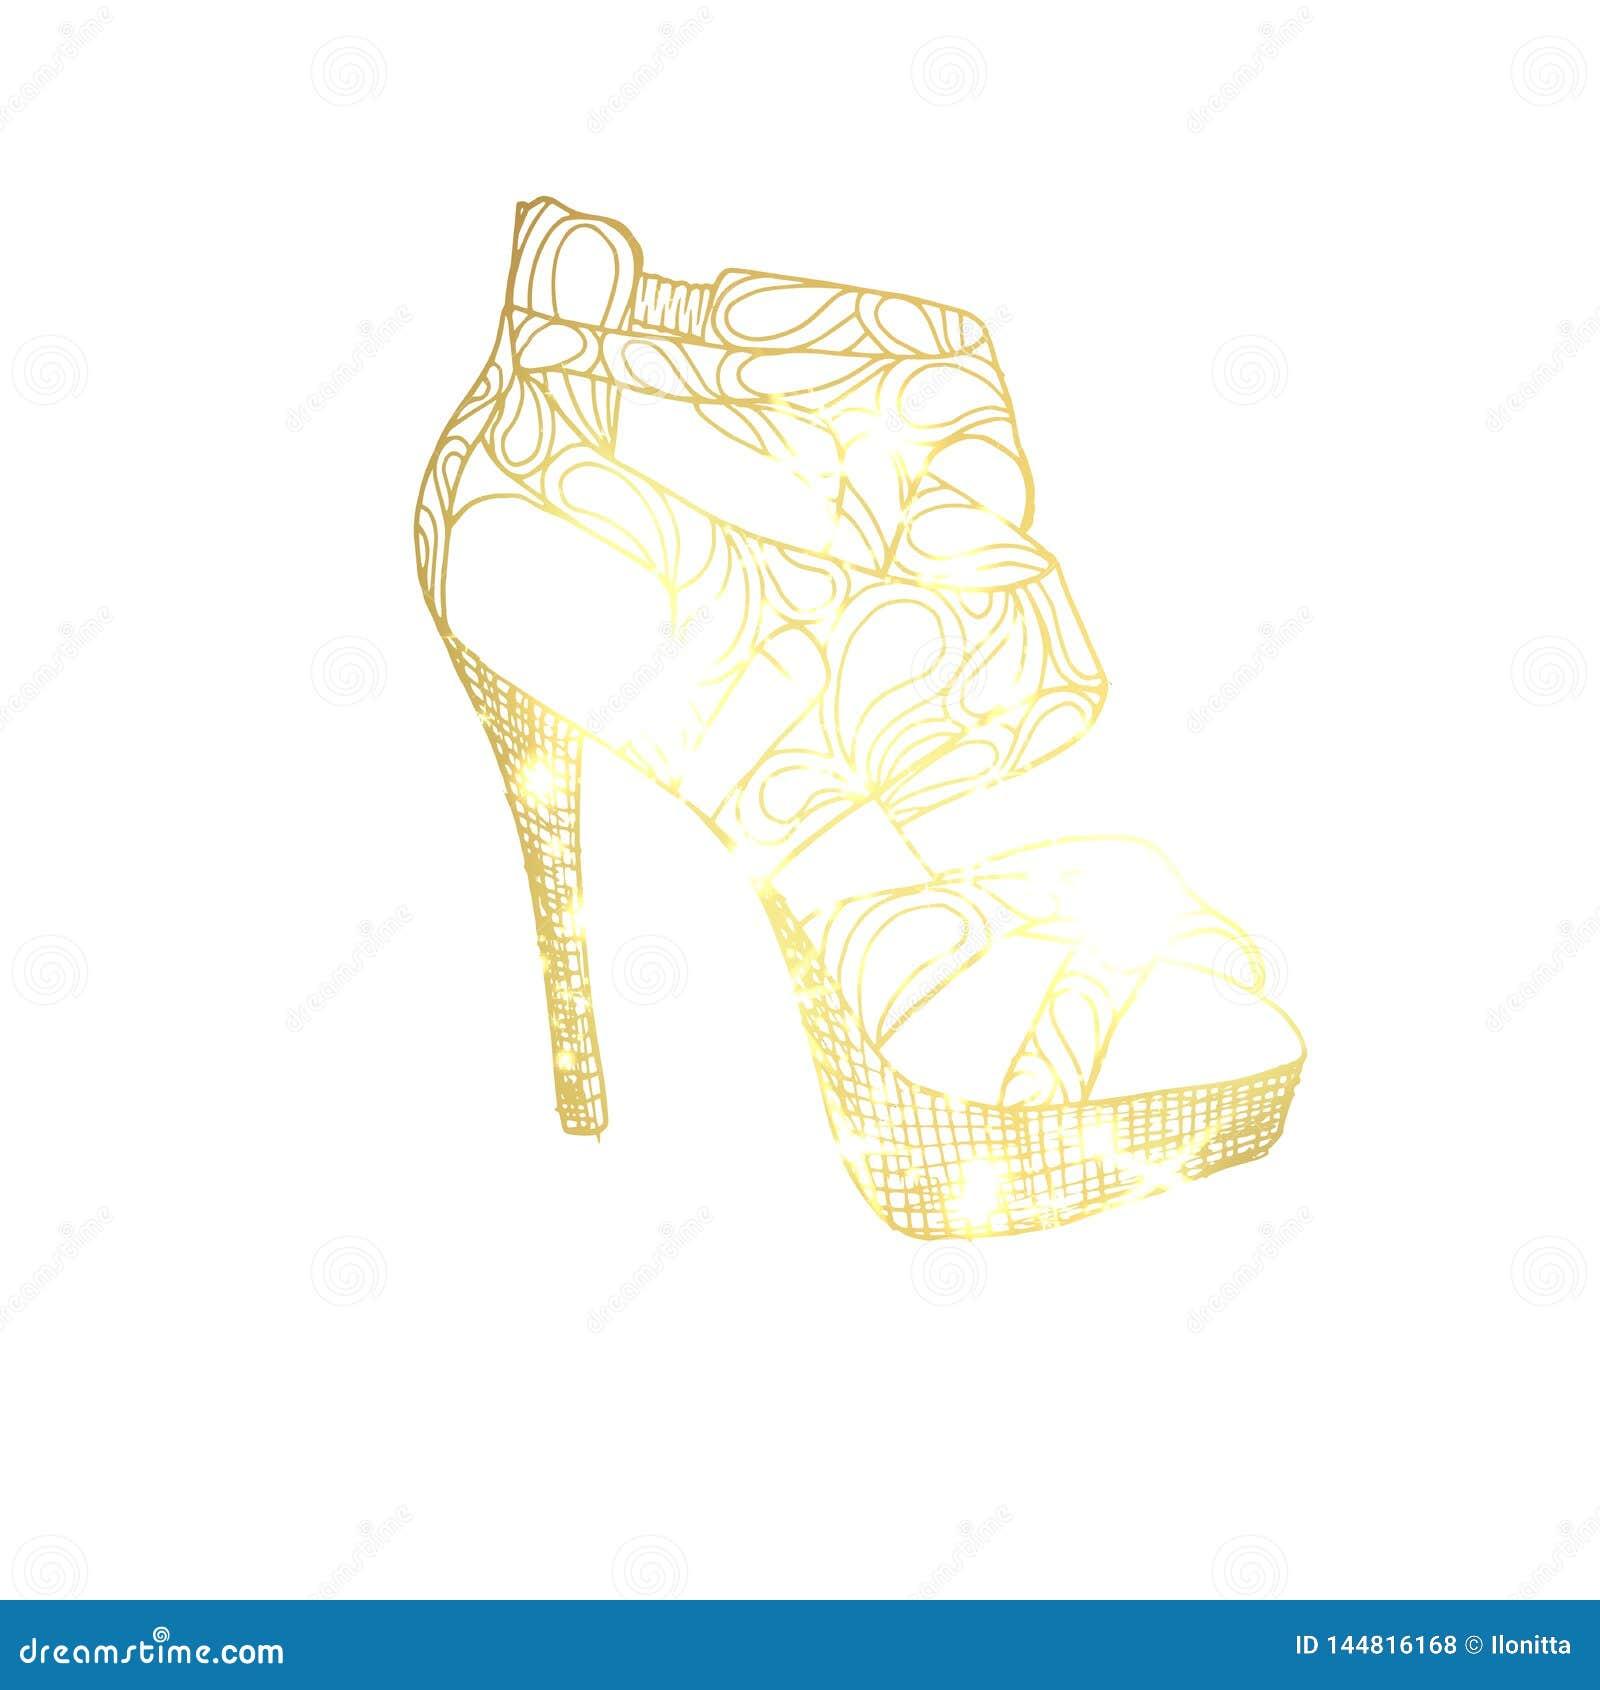 1c837ec2fb6 Golden High Heel Shoe Illustration Stock Vector - Illustration of ...